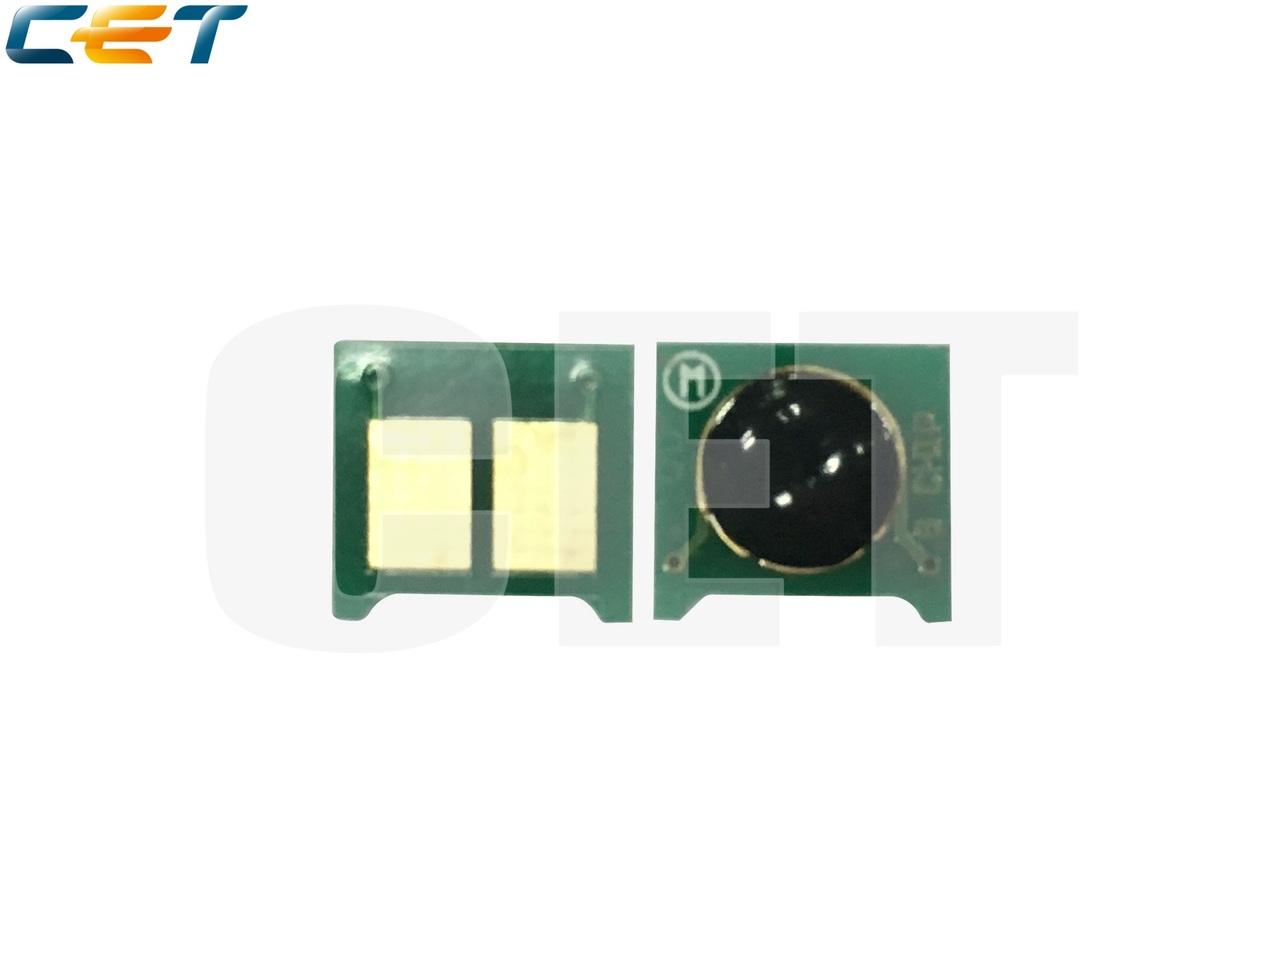 Чип картриджа CB436A, CC388A, CE278A, CE505X, CC364X,CE255X для HP LaserJetP1505/P2035/P2055/P4015/P1566/P1606/P3015 (CET), (WW),(унив.), 2K/1.5K/2.1K/6.5K/24K/12.5K, CET0935